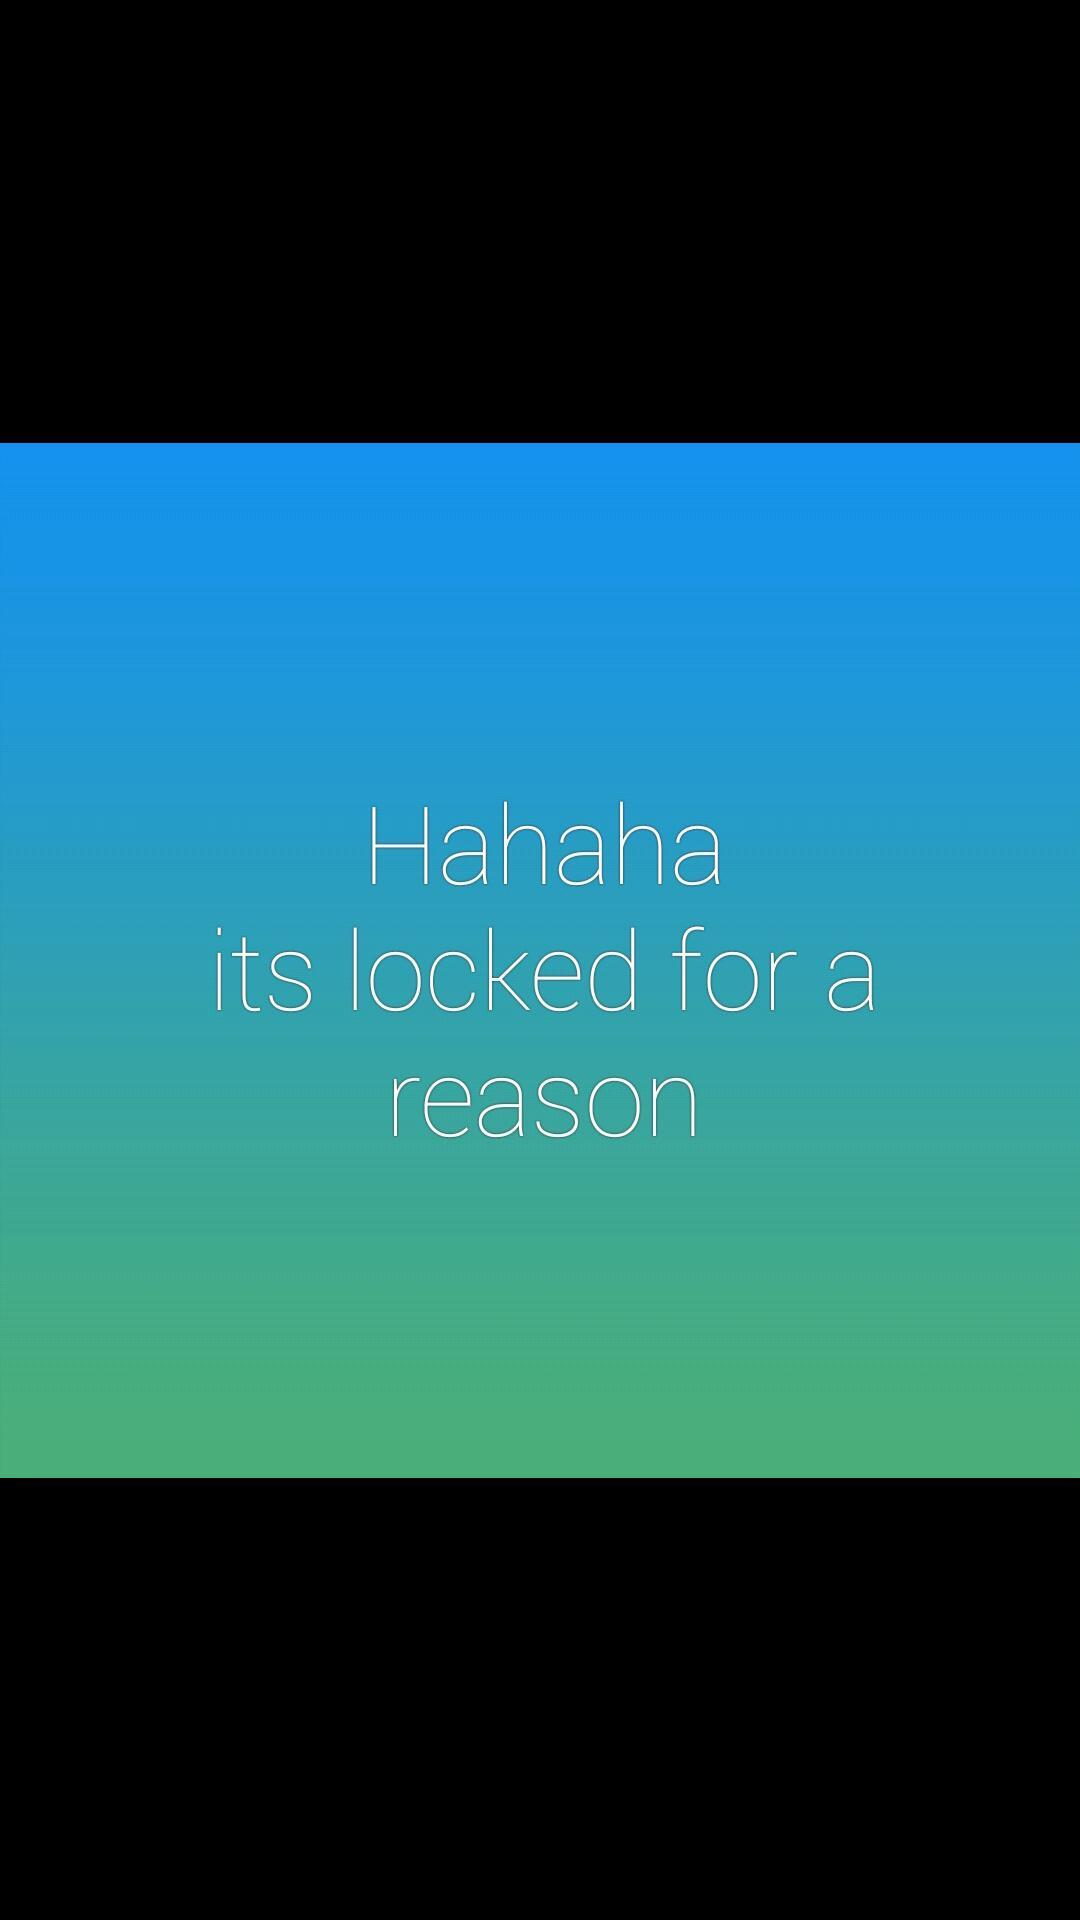 Lock Screen Background HD Wallpaper - 072